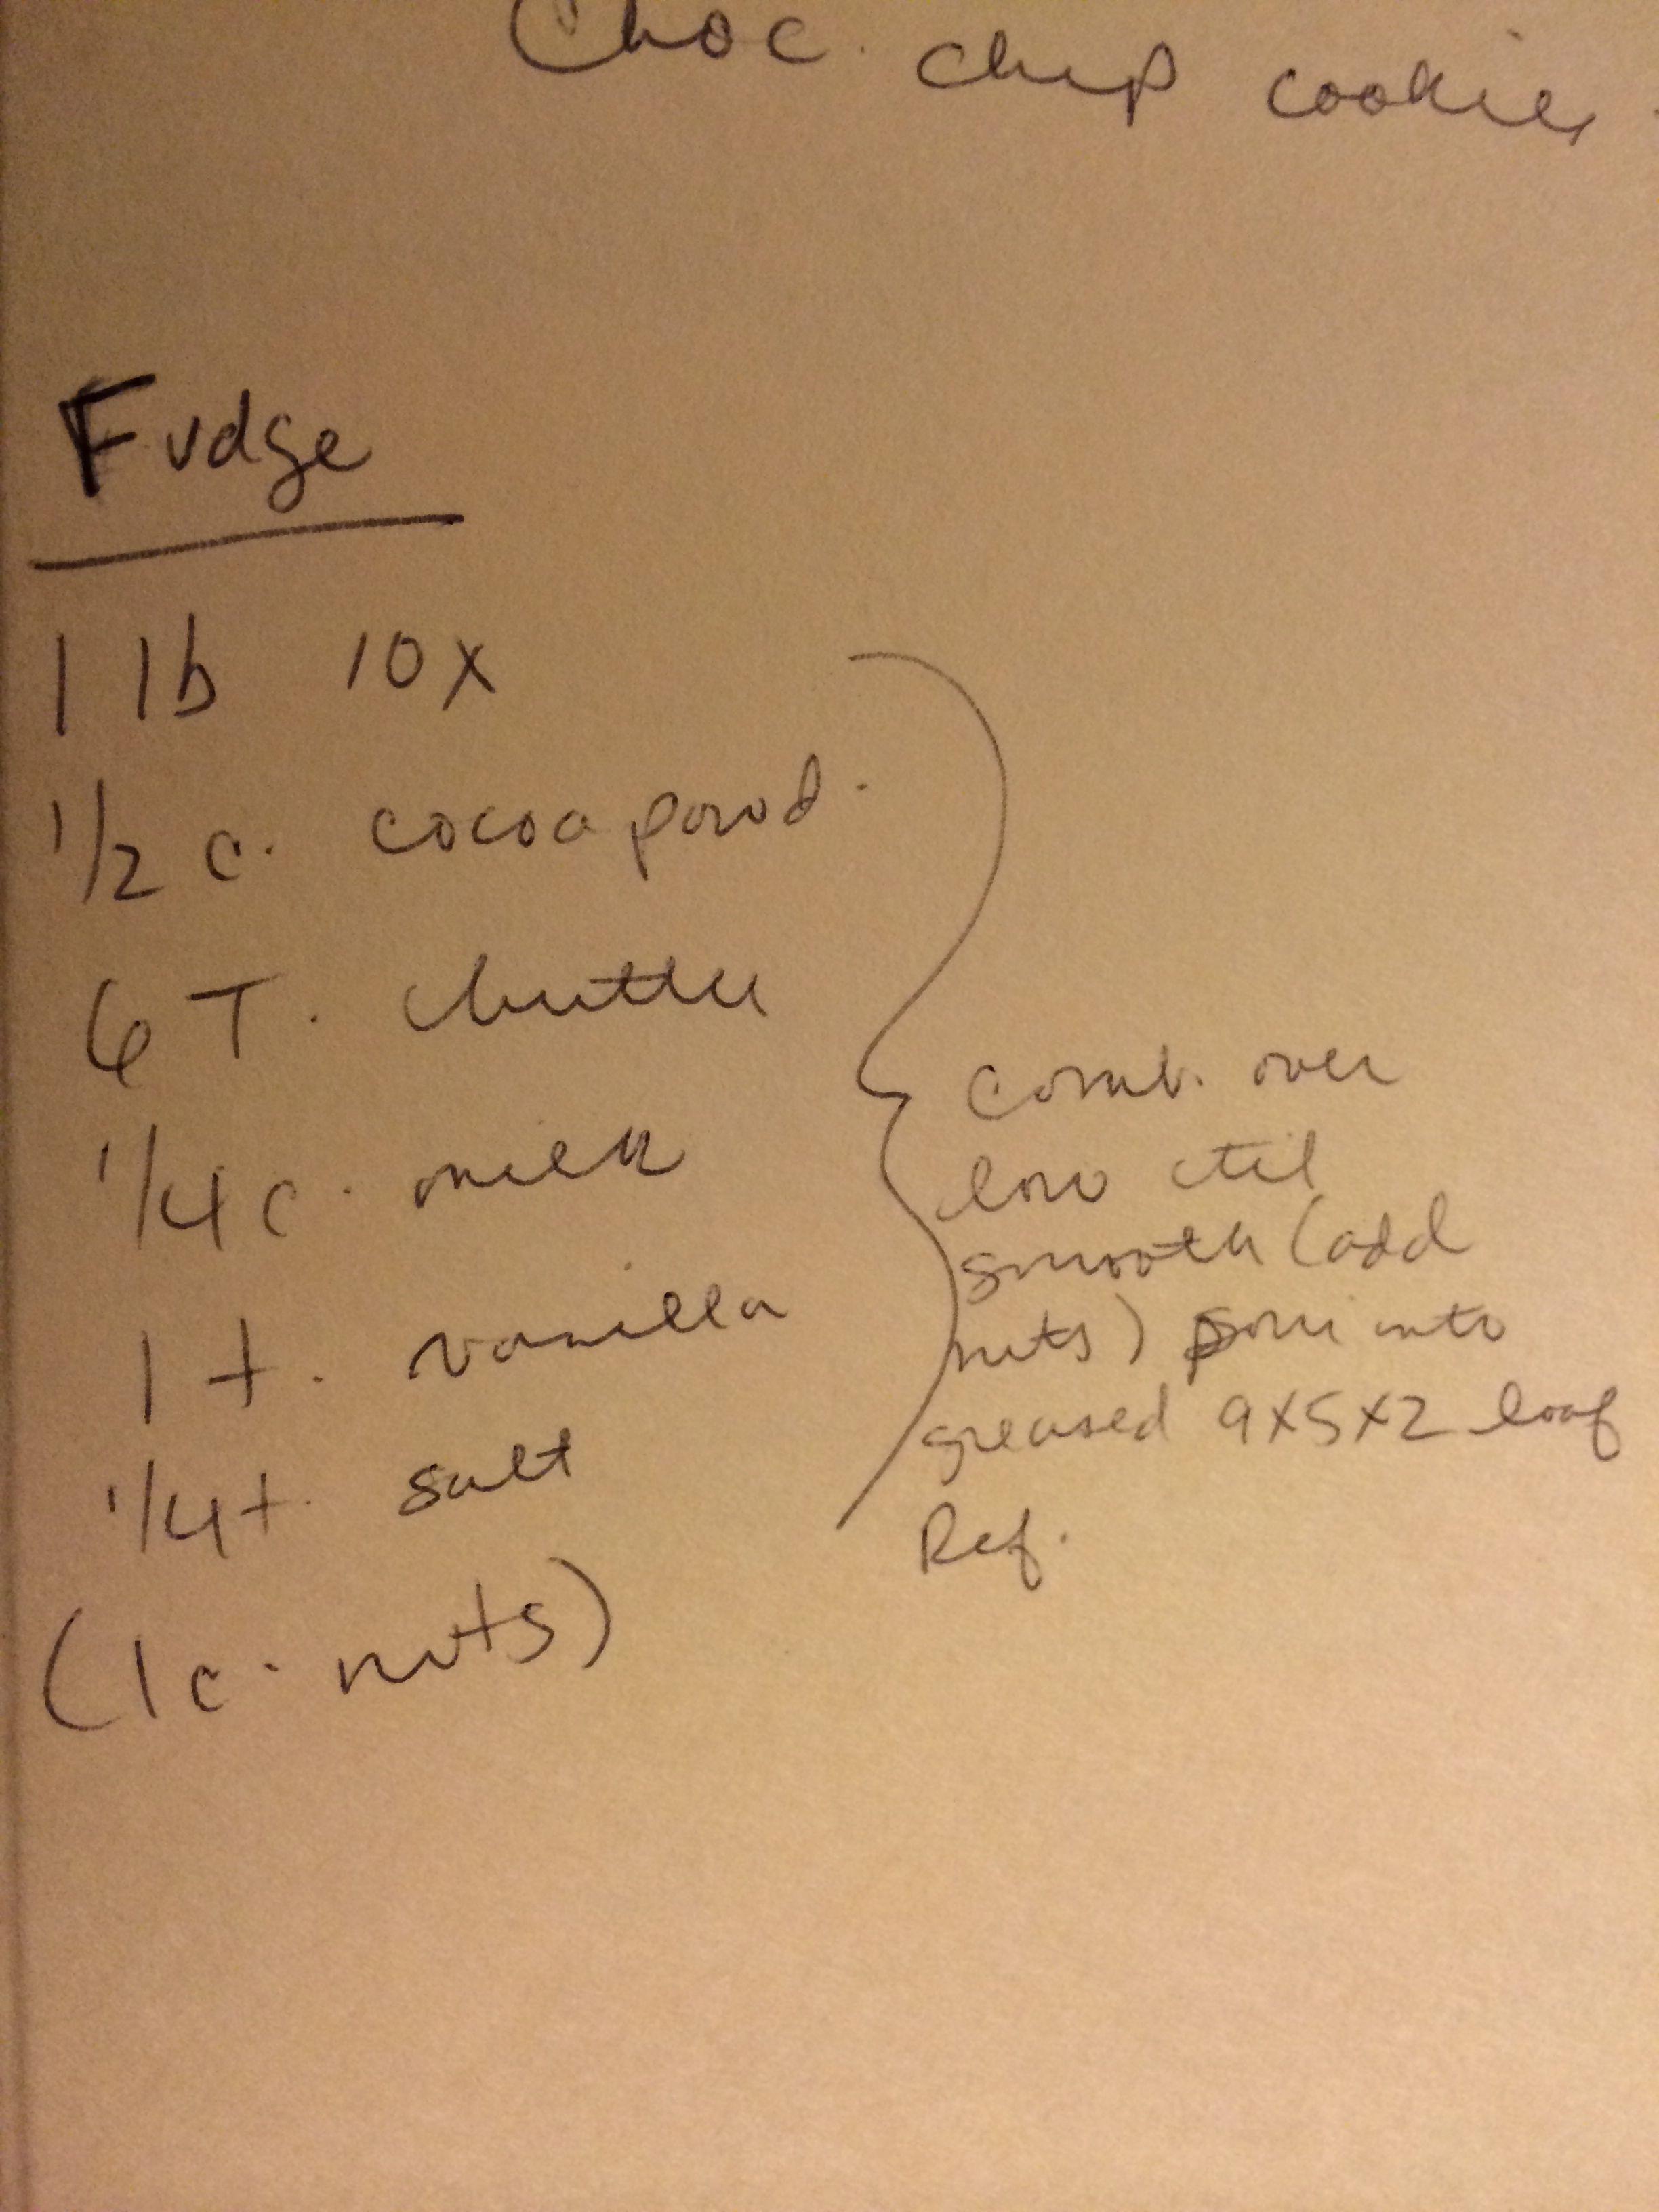 10x fudge